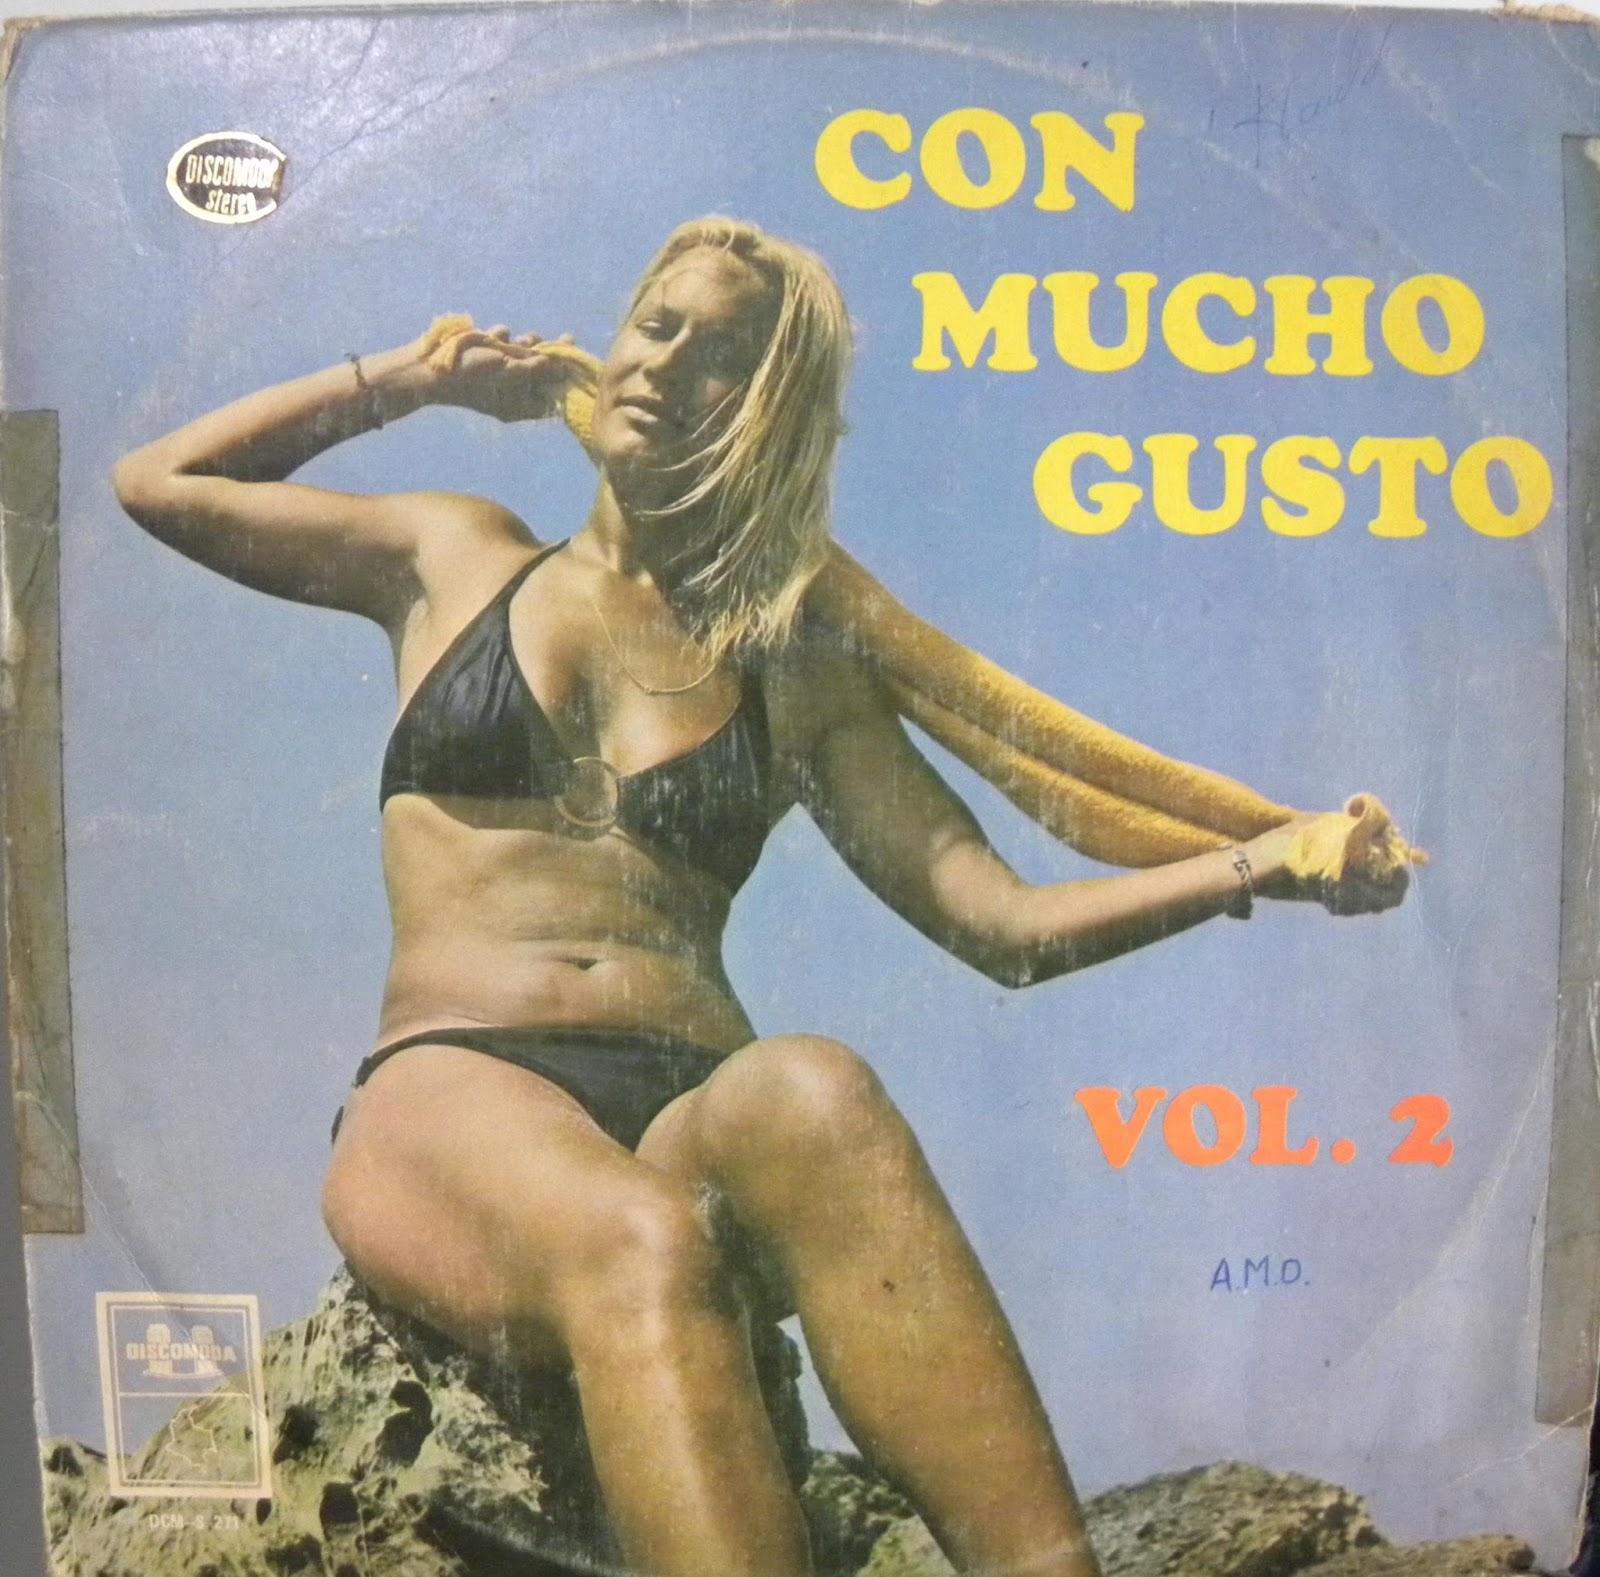 Melodias de colombia con mucho gusto vol 02 - Con mucho gusto ...